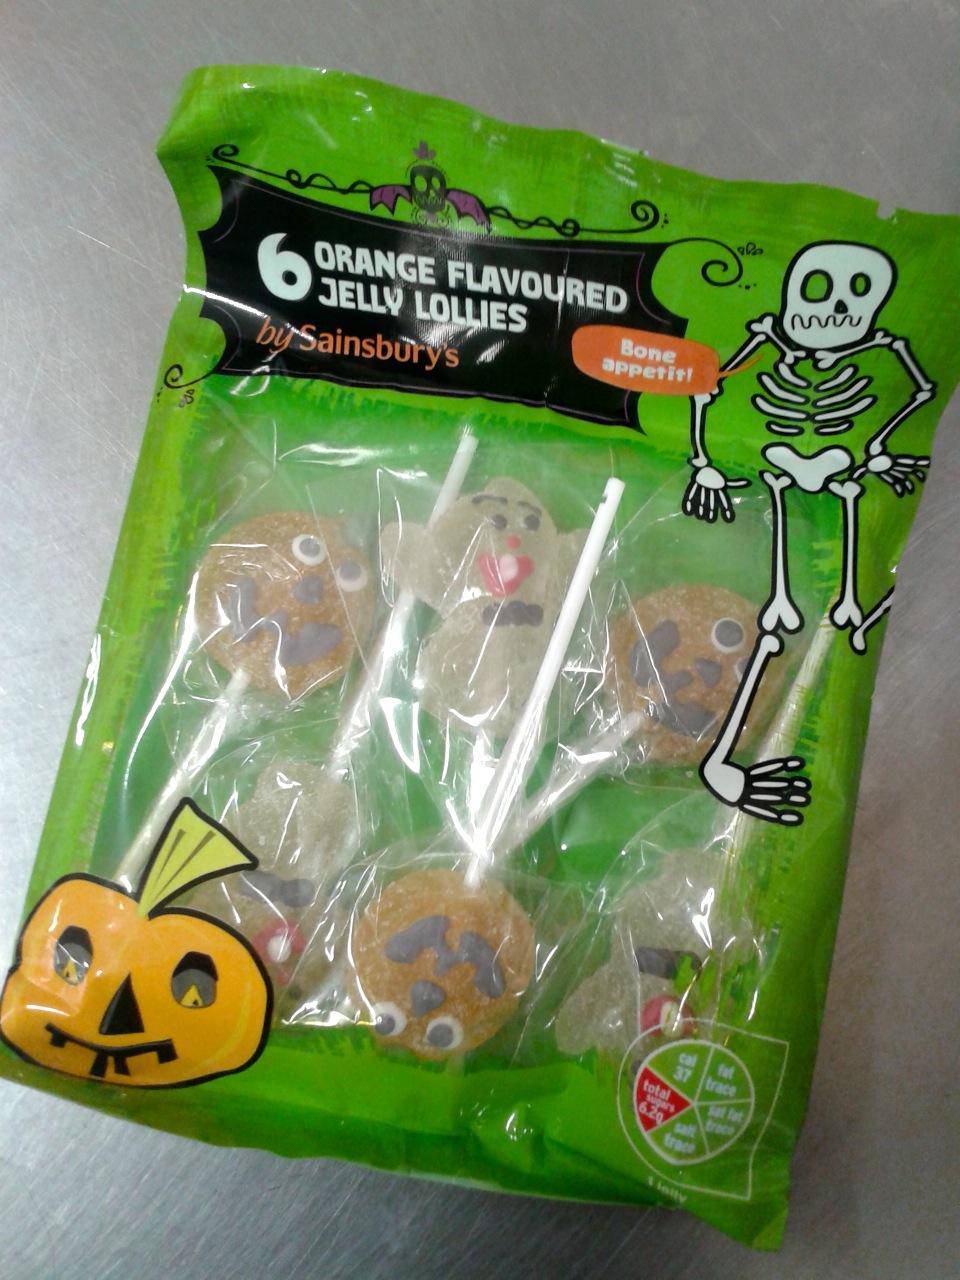 http://i2.wp.com/fatgayvegan.com/wp-content/uploads/2014/10/sweets.jpg?fit=960%2C1280